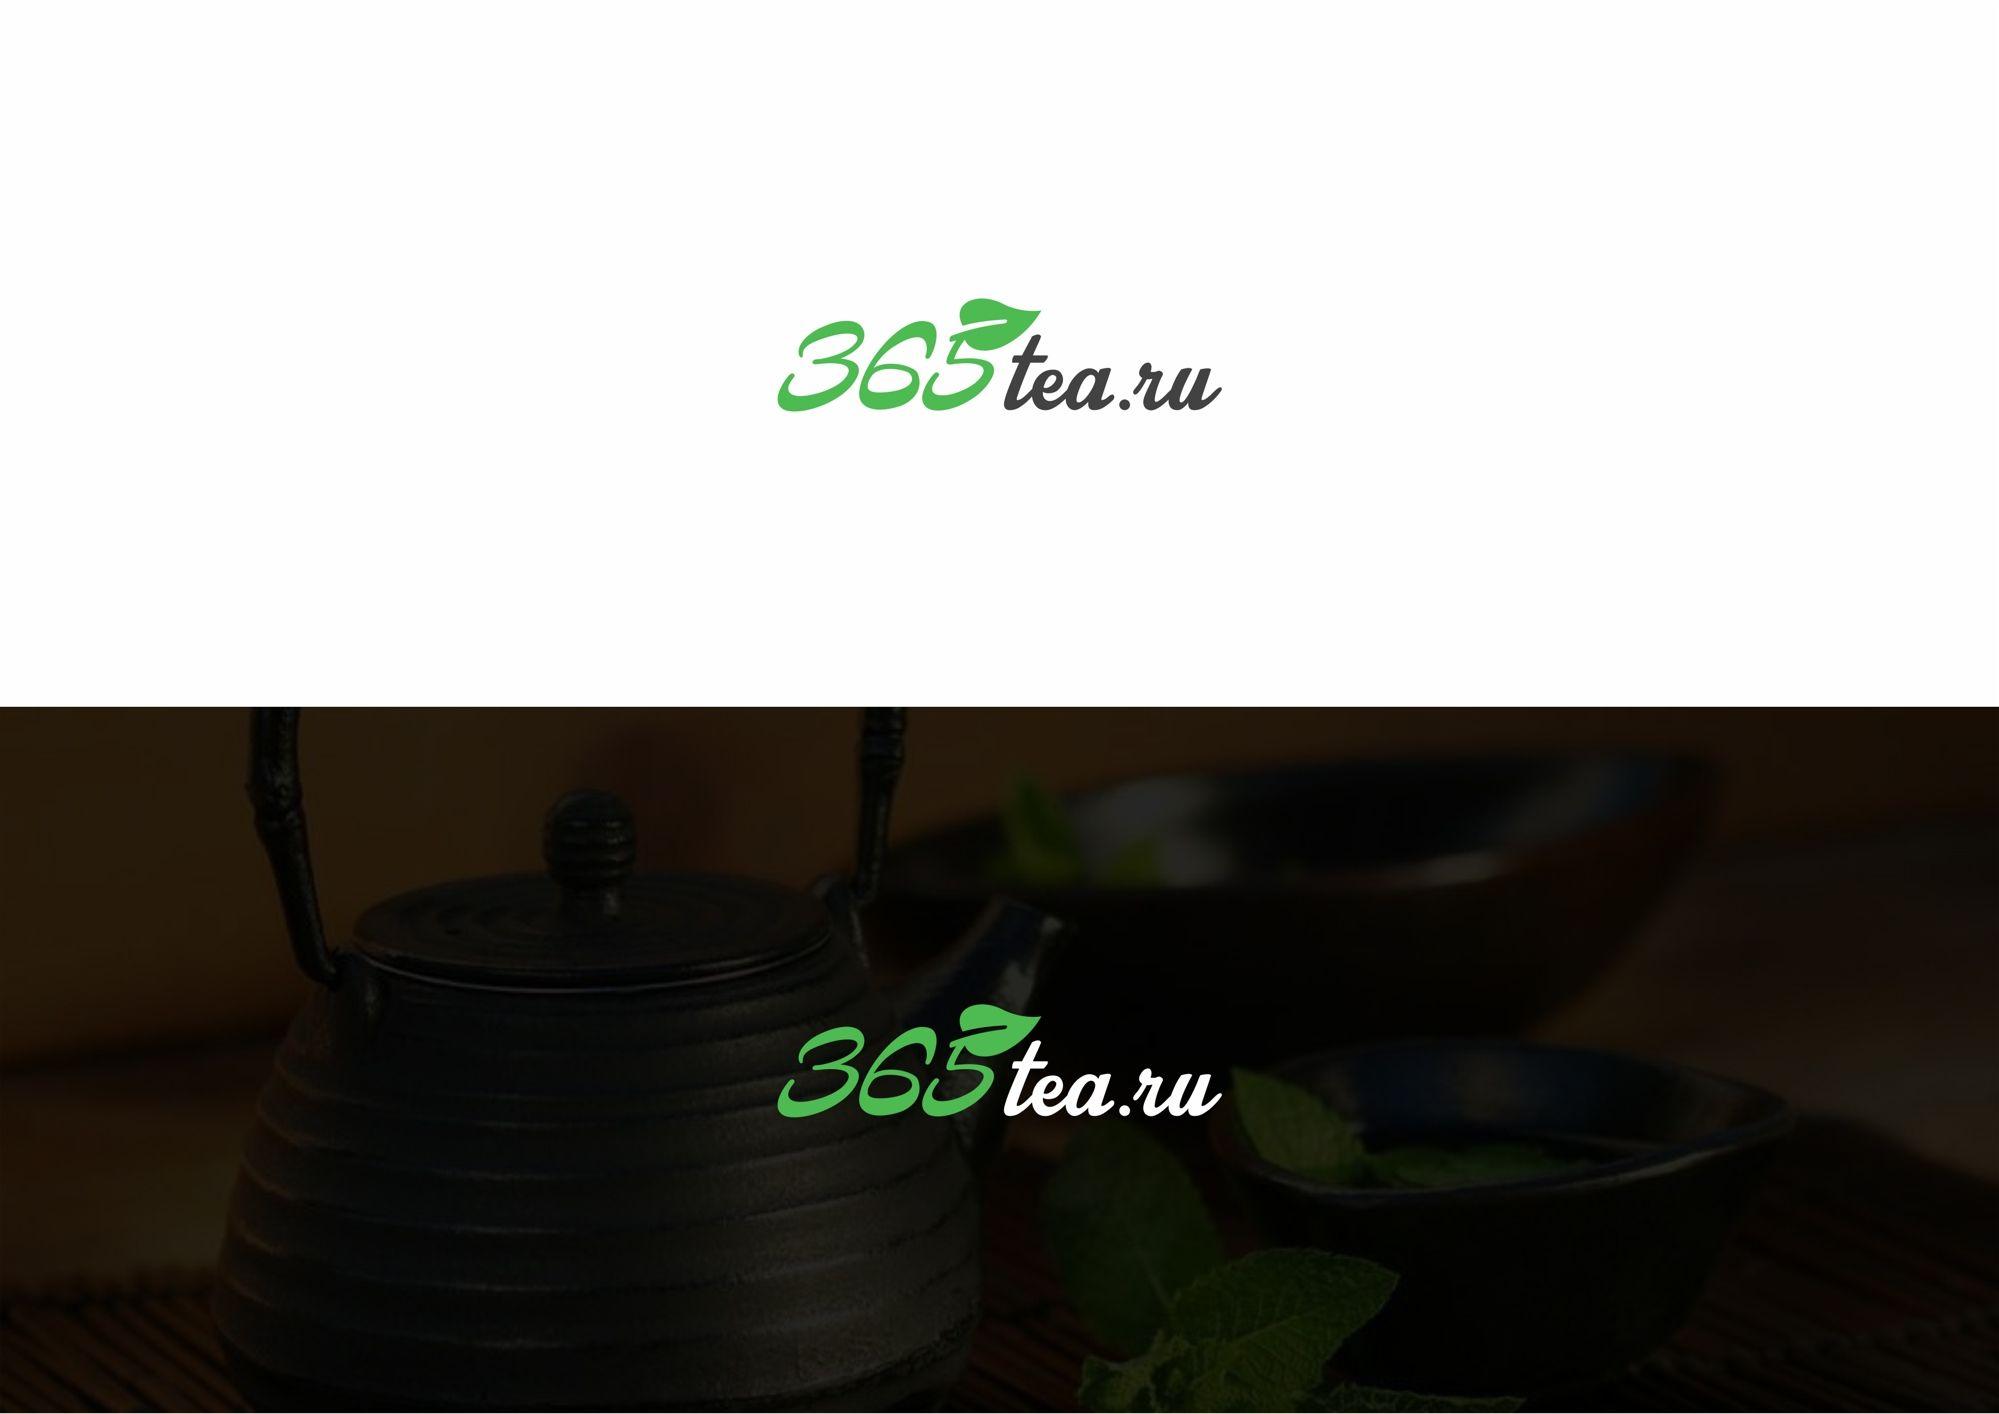 Логотип для 365tea.ru или 365TEA.RU - дизайнер rowan